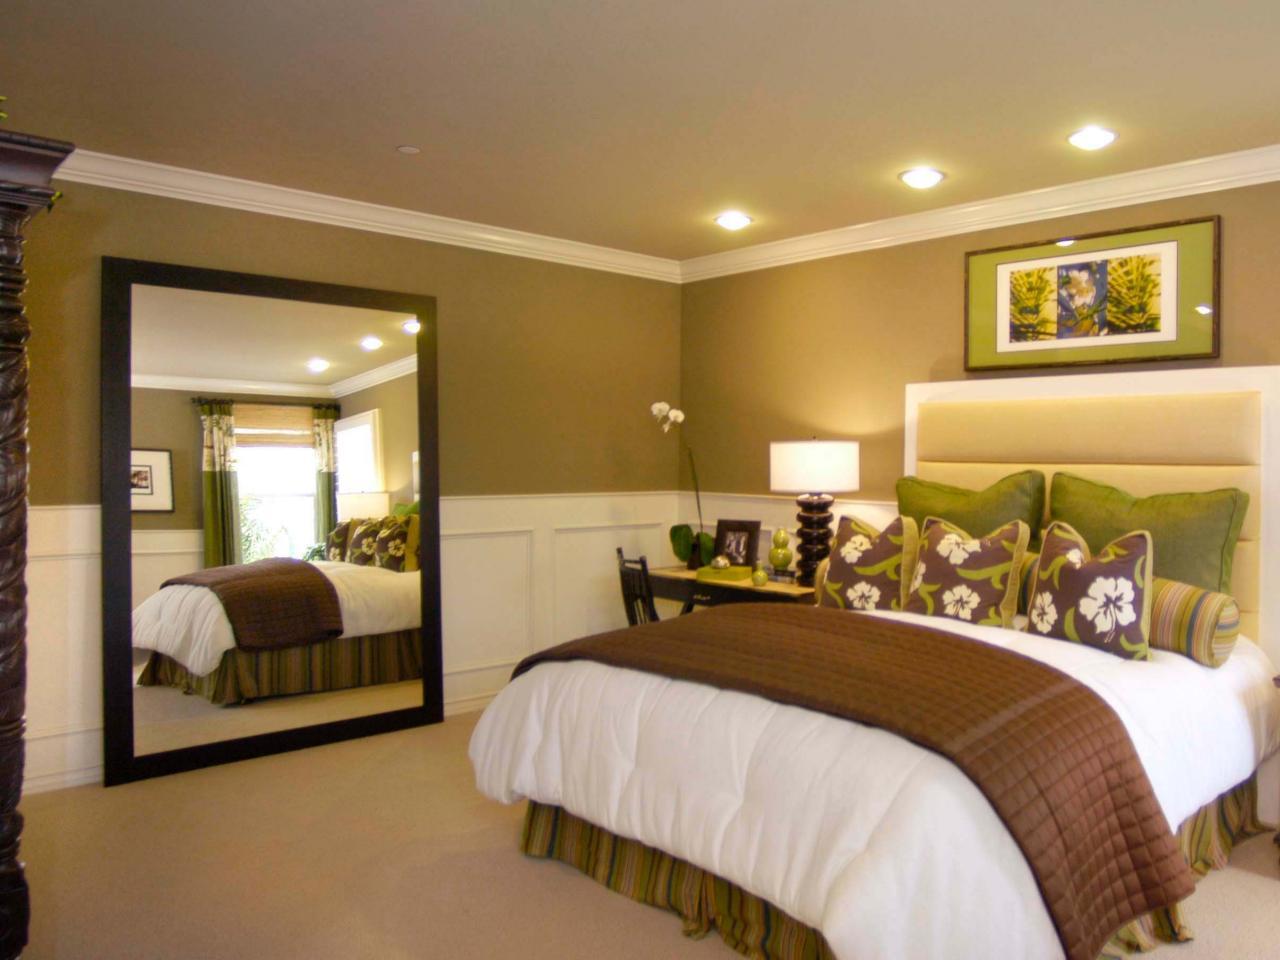 bedroom lighting ideas illuminating combination QEOSZLU